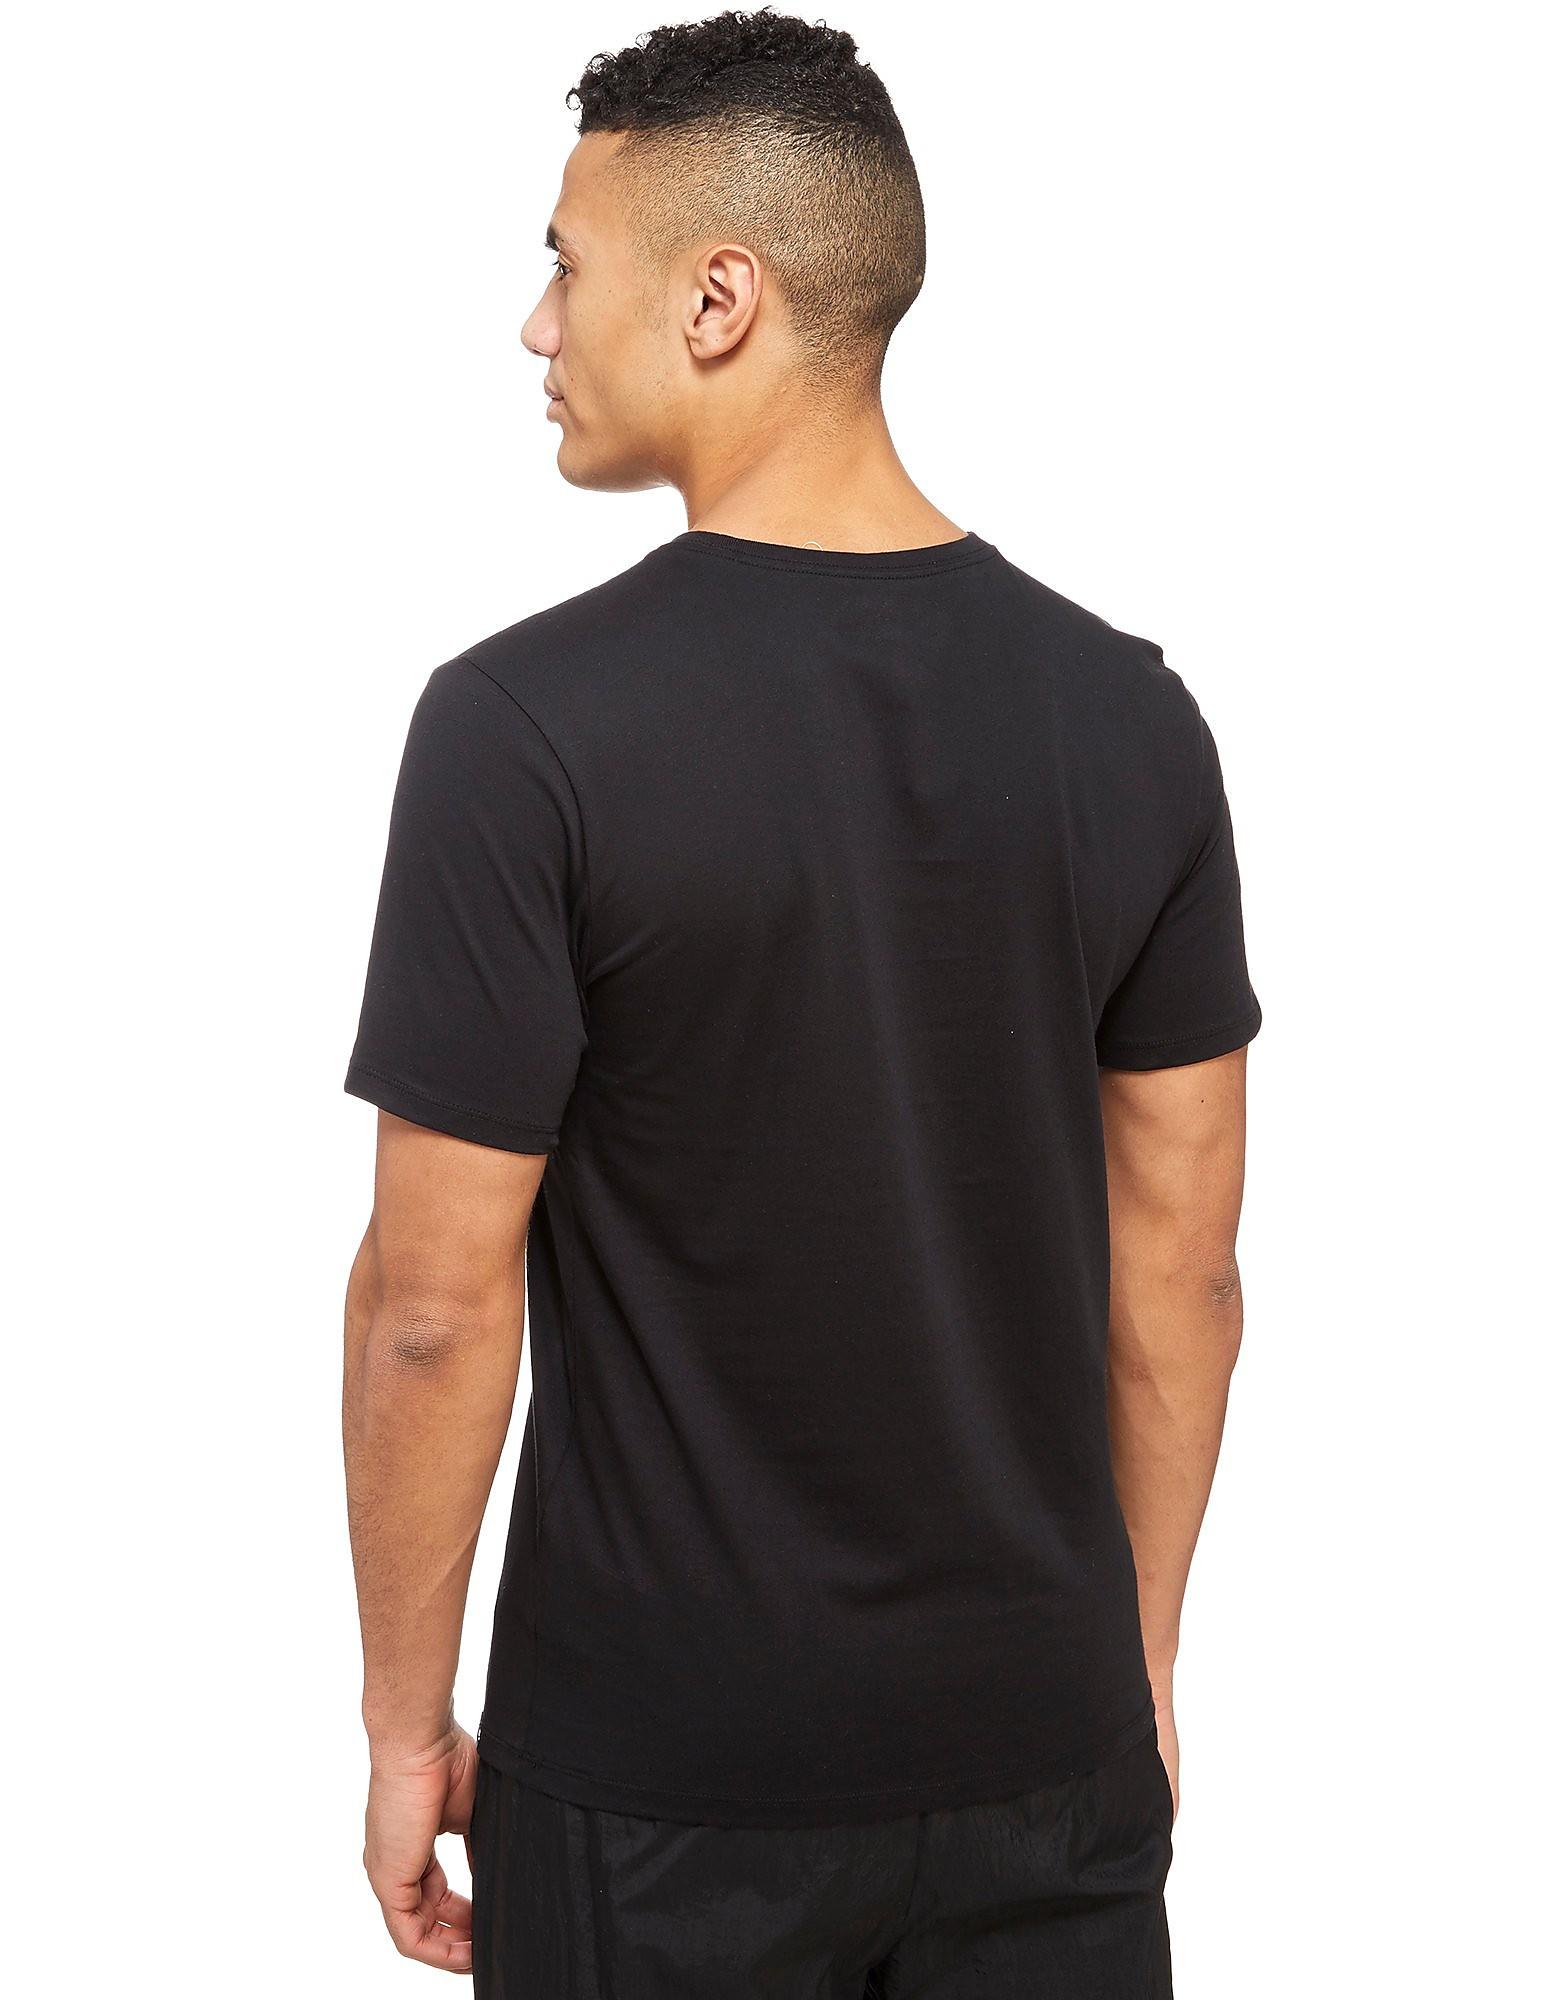 Jordan Photo T-Shirt